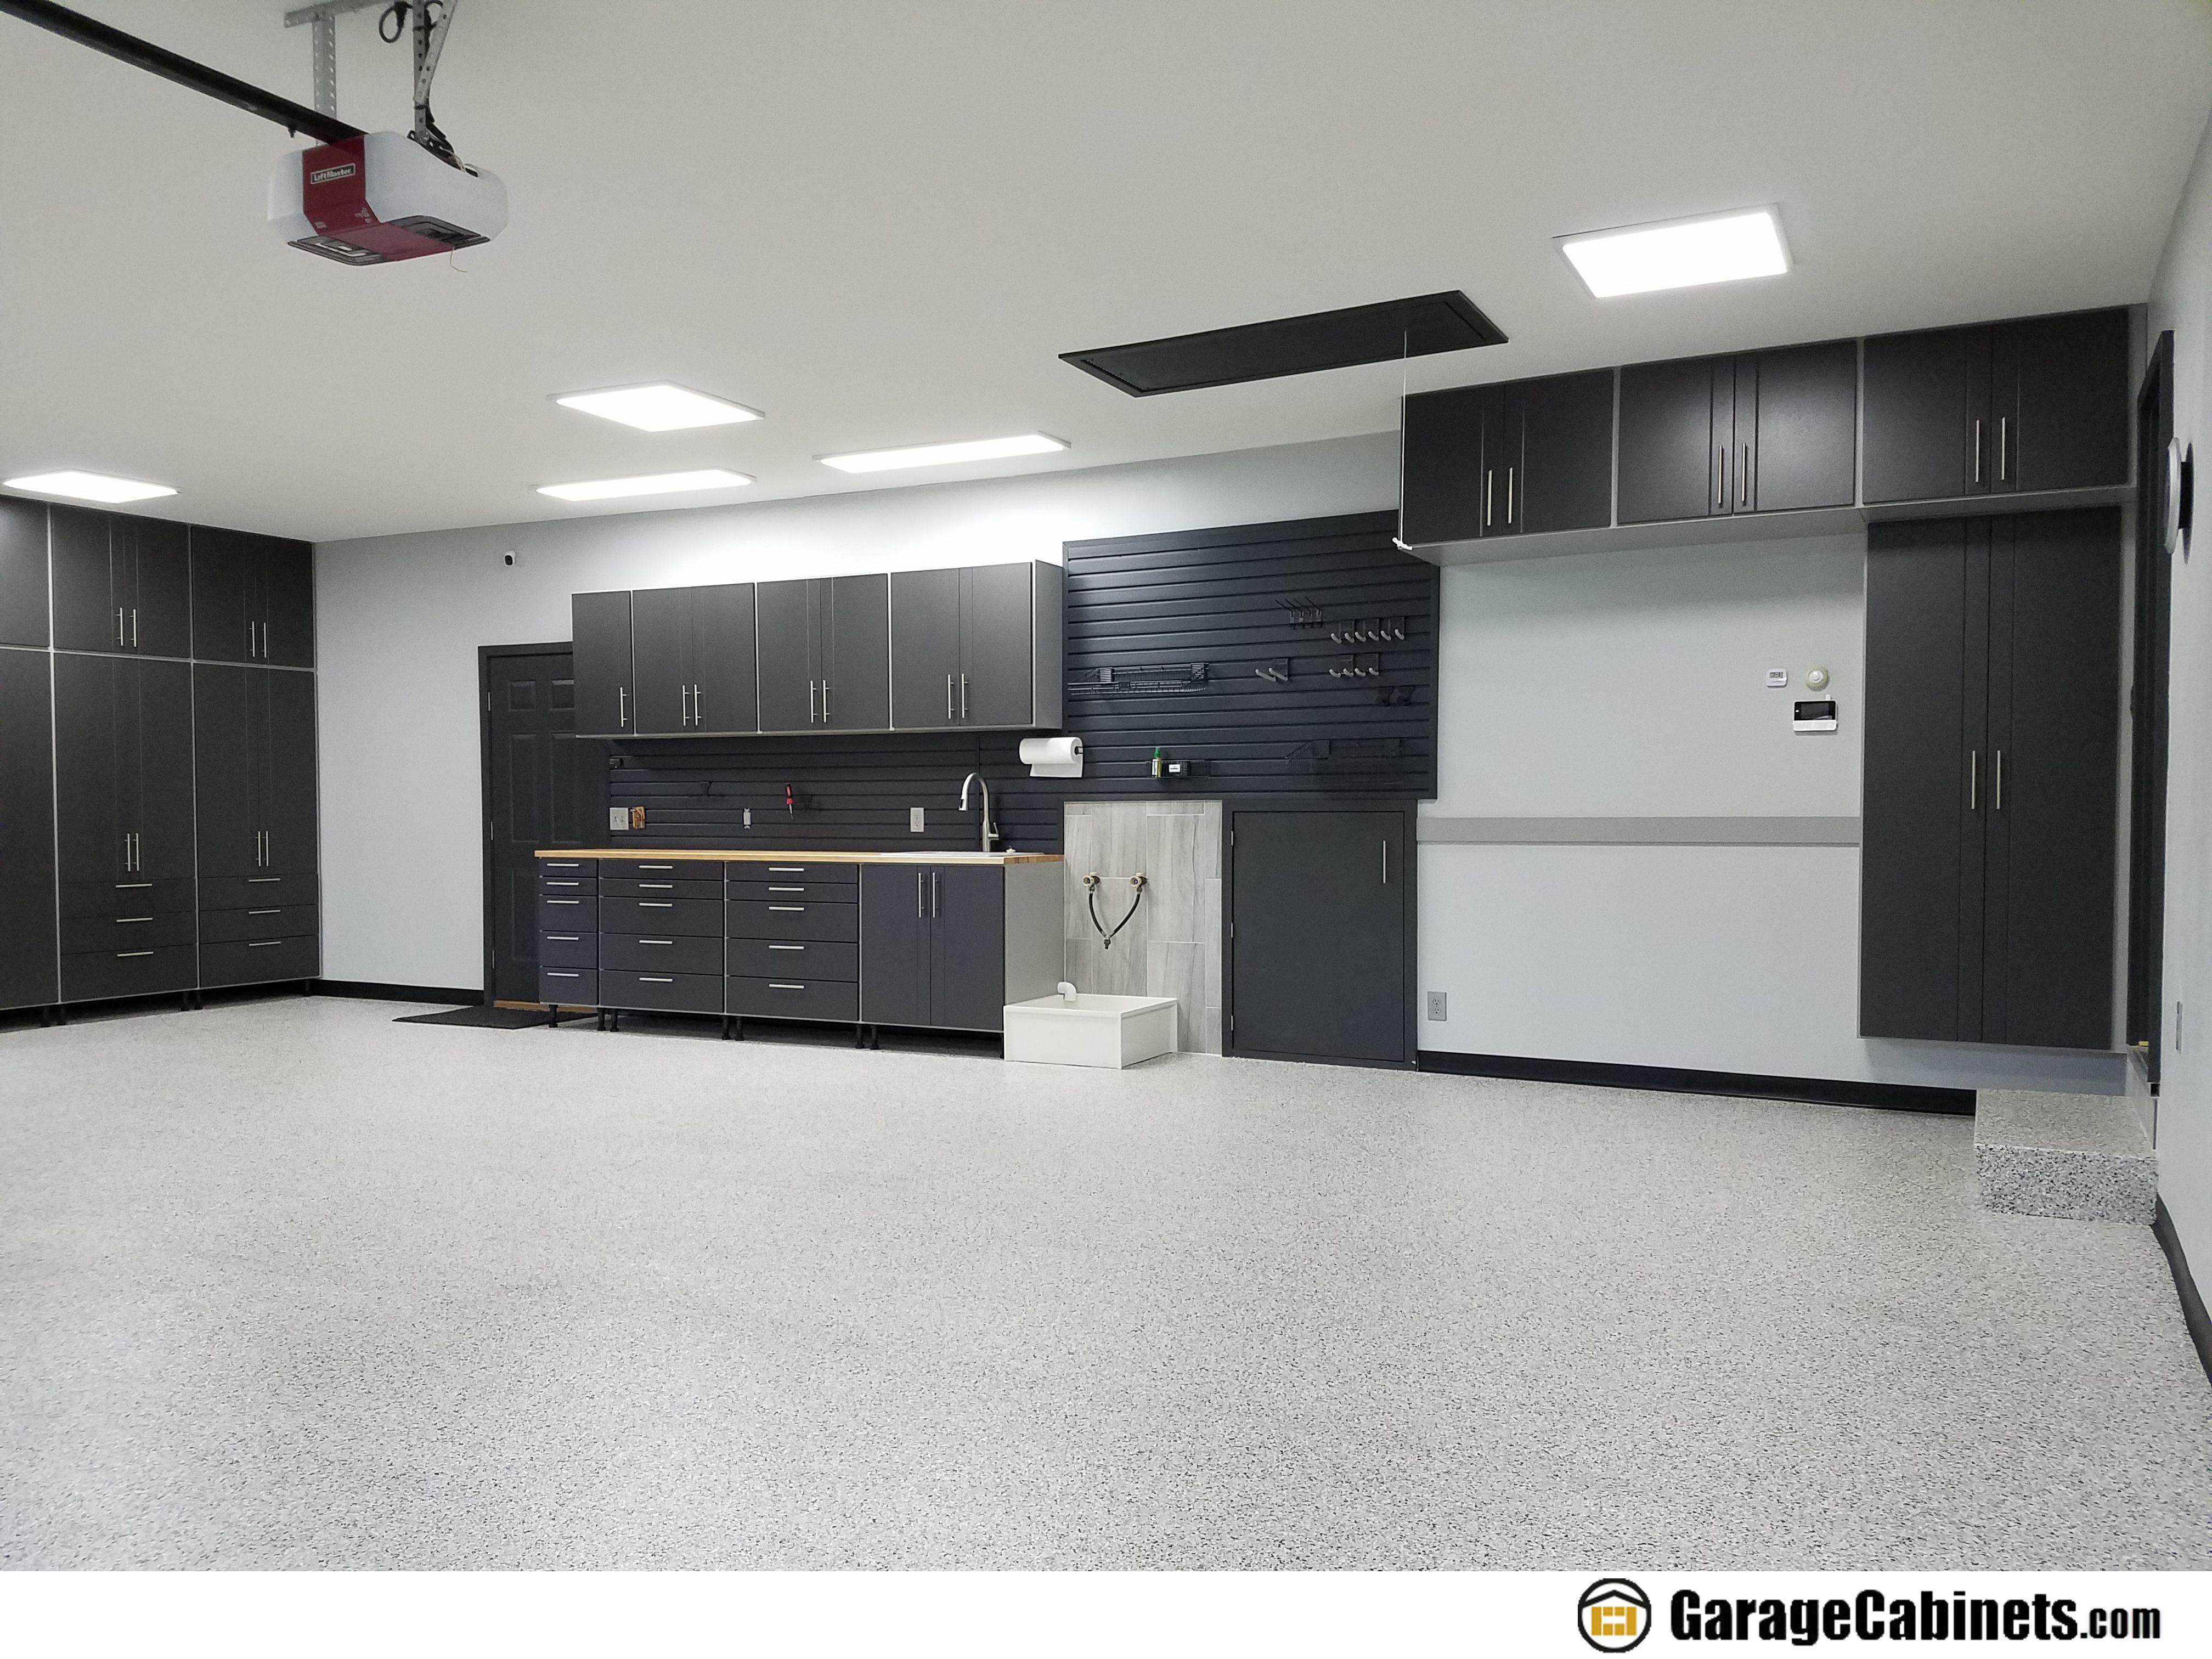 Garagecabinets Com Manufactures The Finest Garage Storage Systems